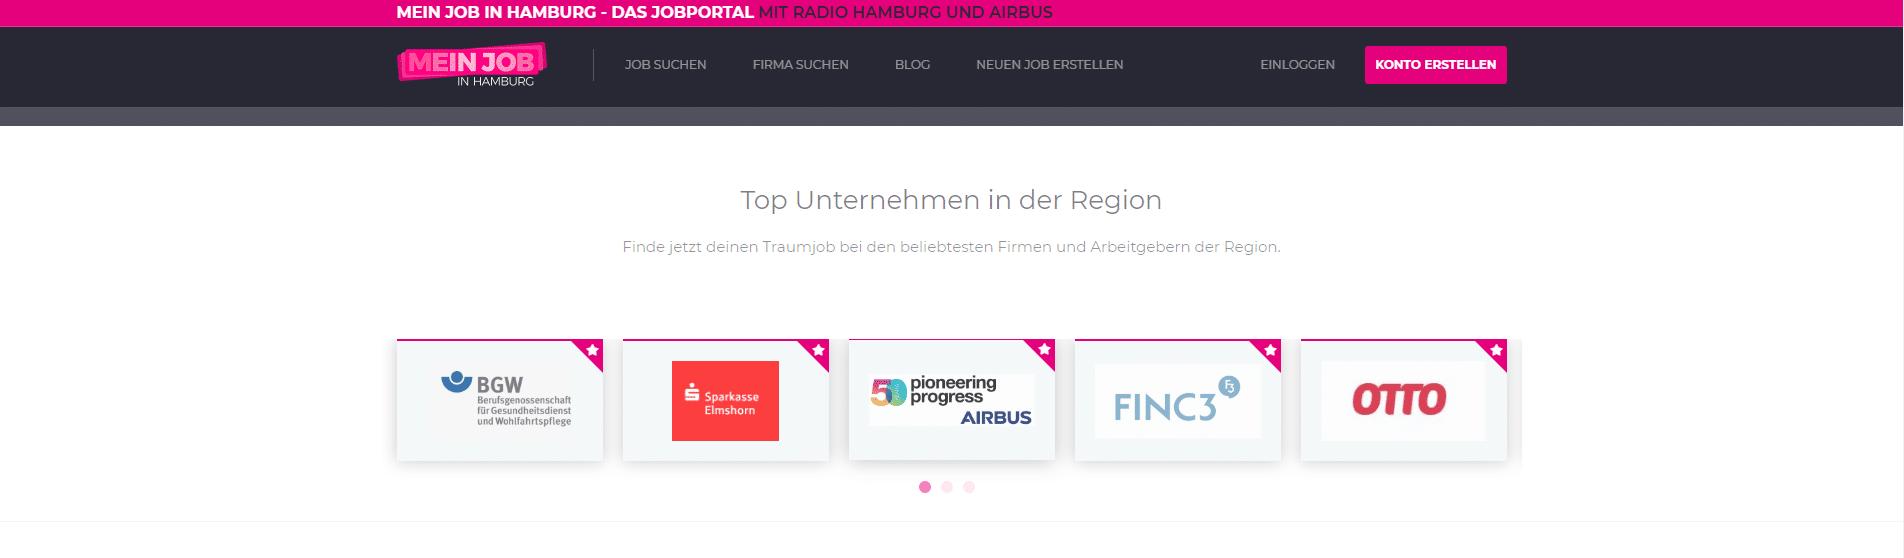 Top Unternehmen Screenshot